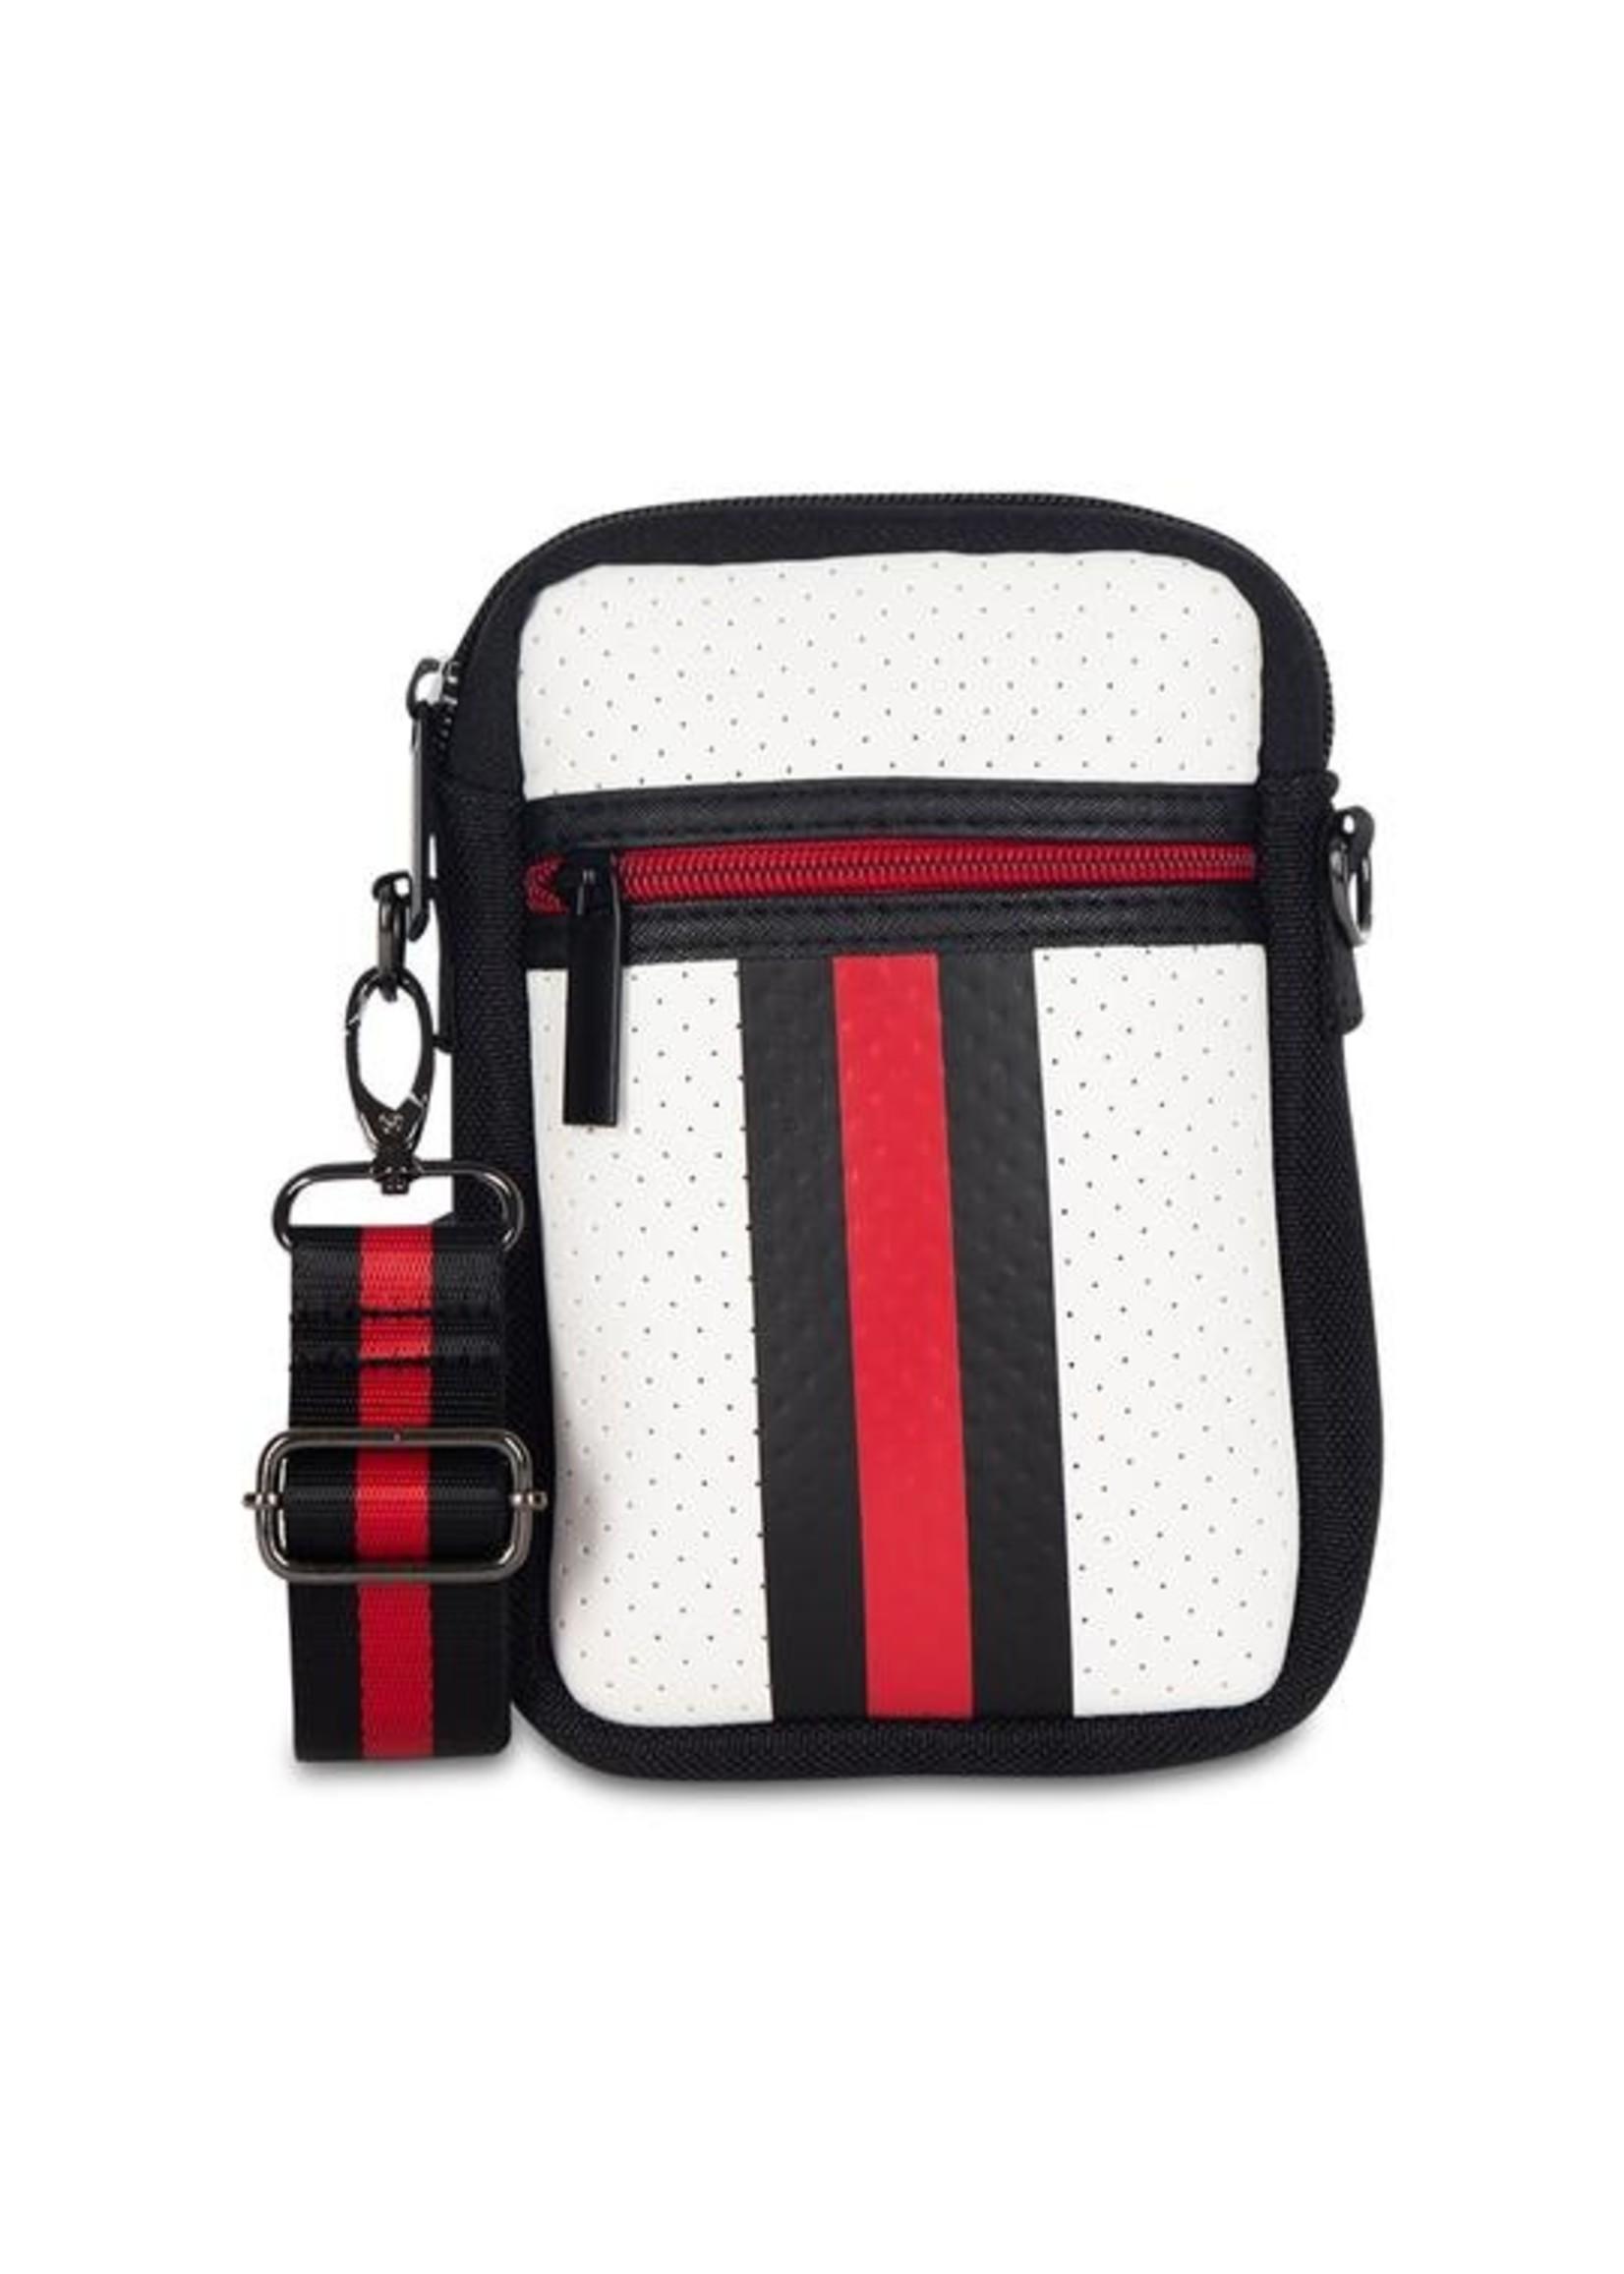 Black/wht/red phone bag